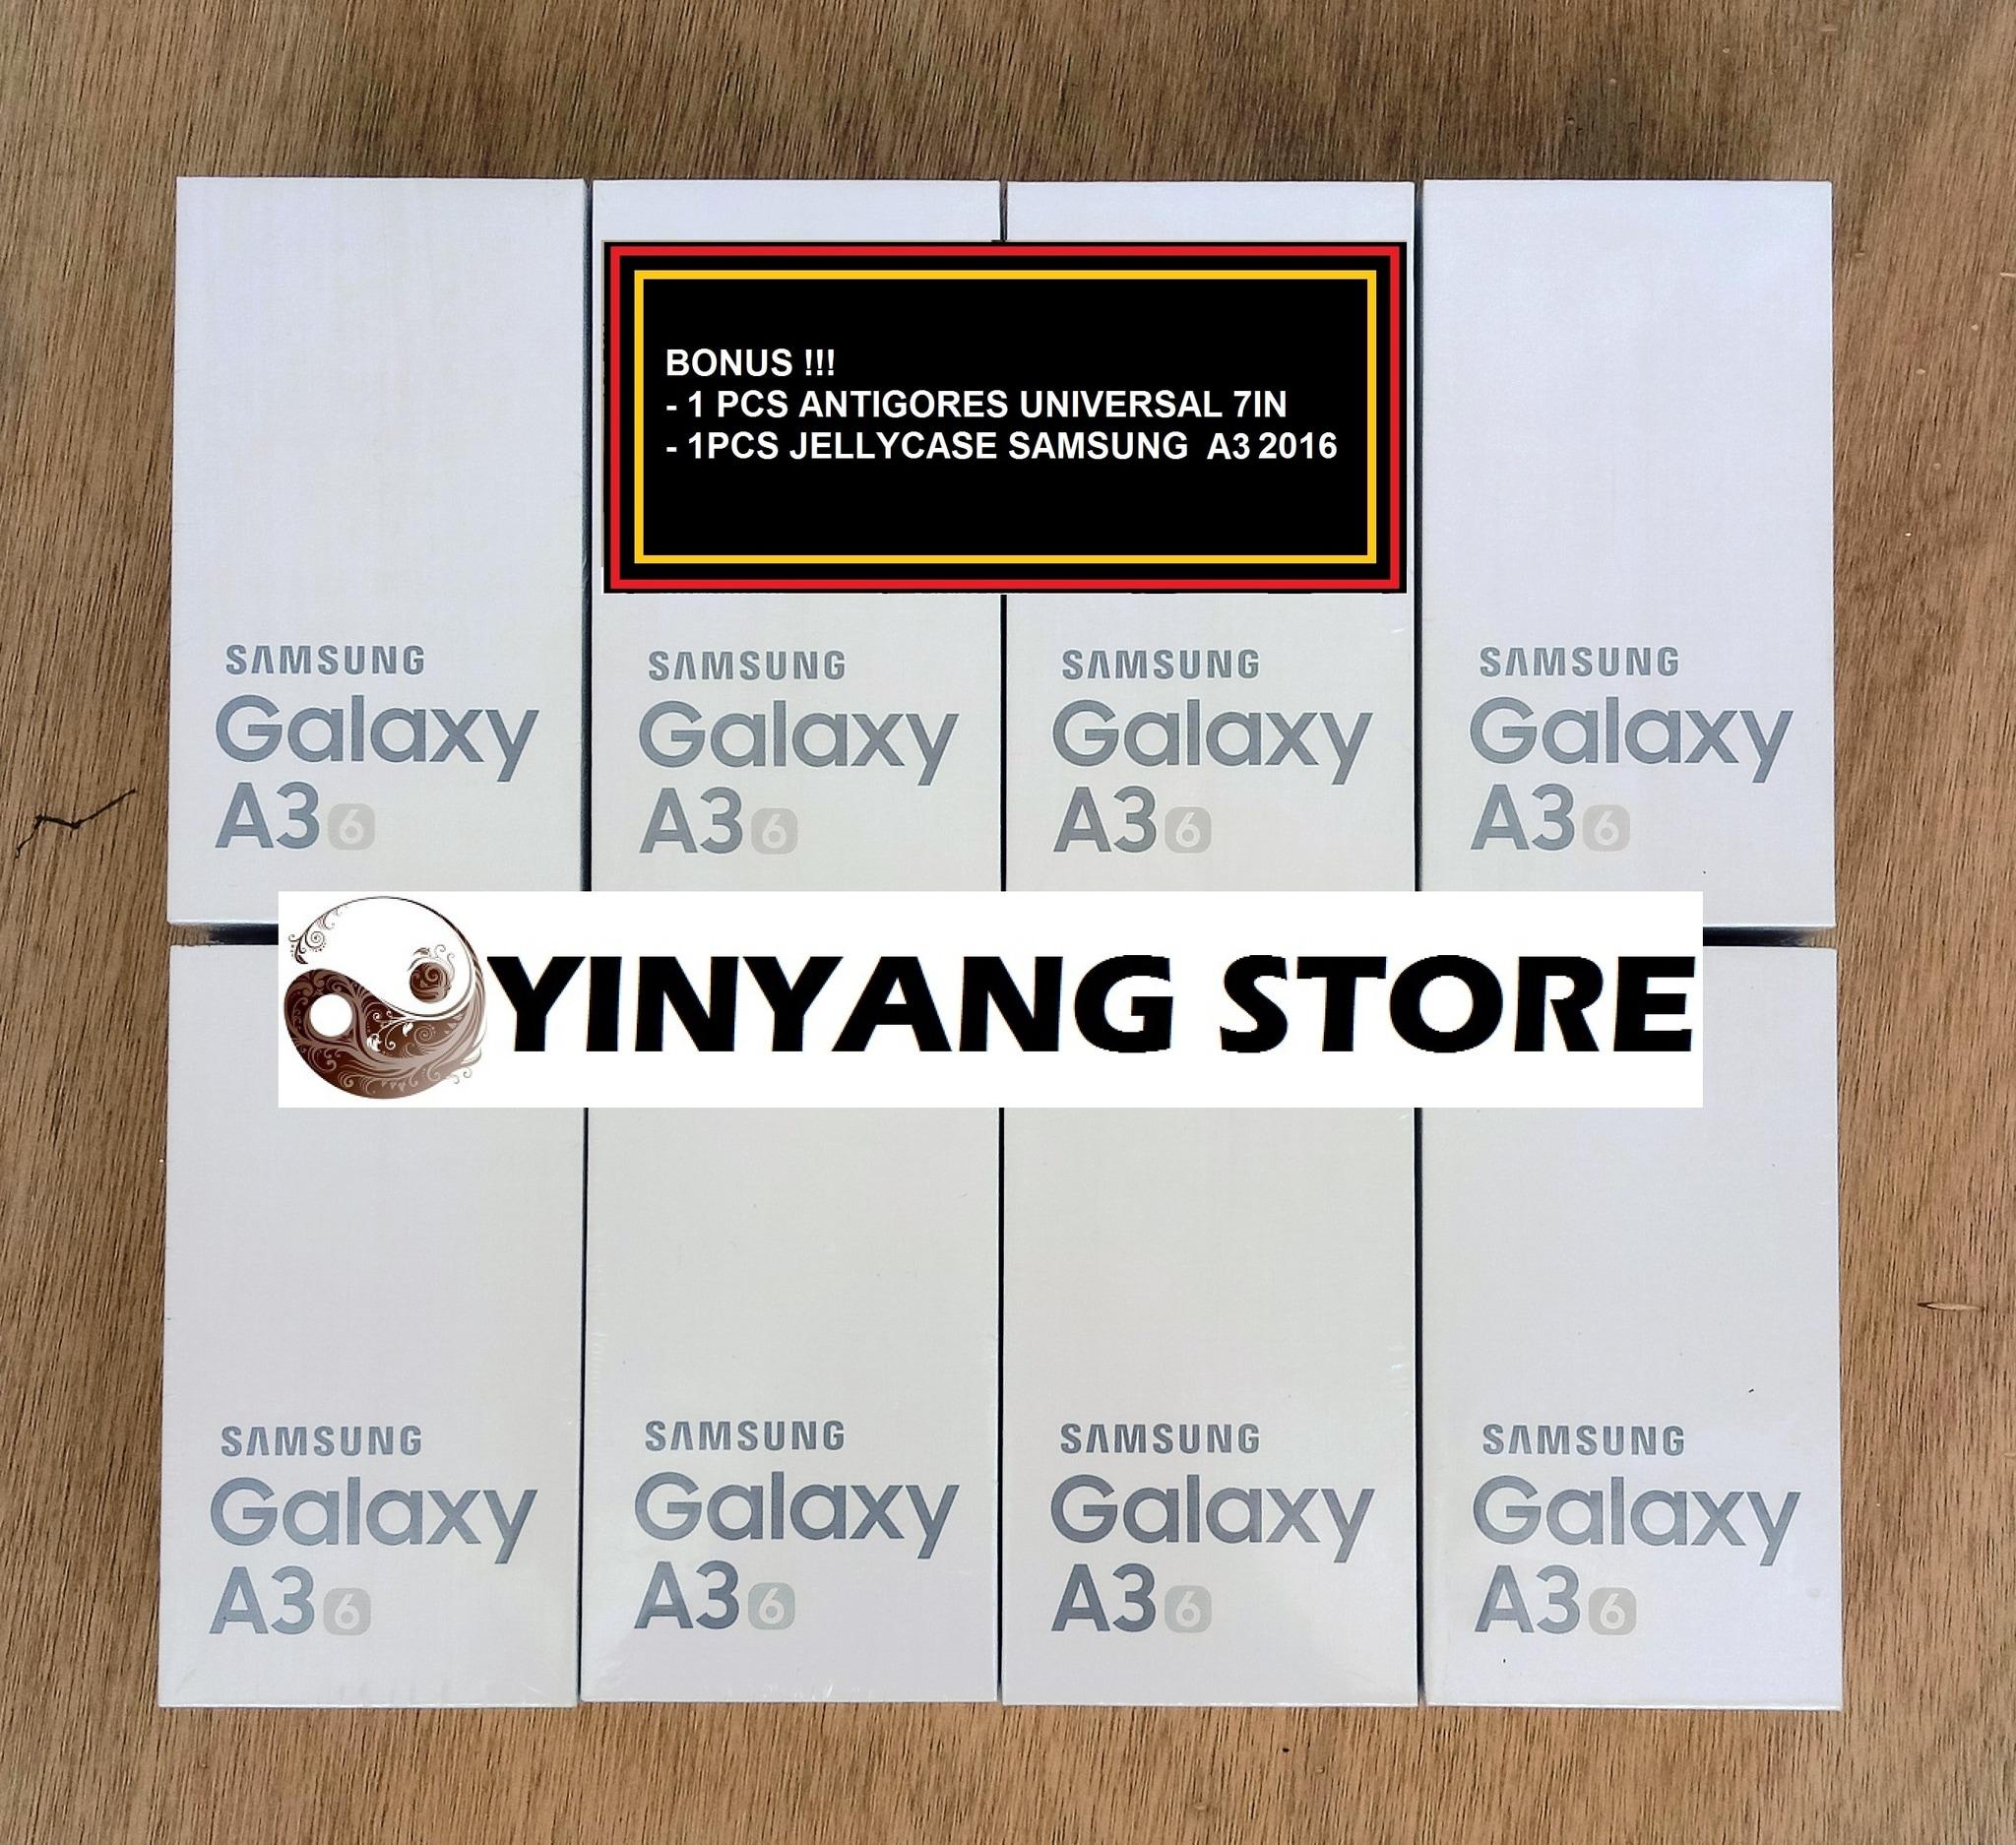 Jual Samsung Galaxy A3 2016 Dual Sim Garansi Resmi Sein Antigores 16gb Gold Indonesia Bening Yinyang Store Tokopedia